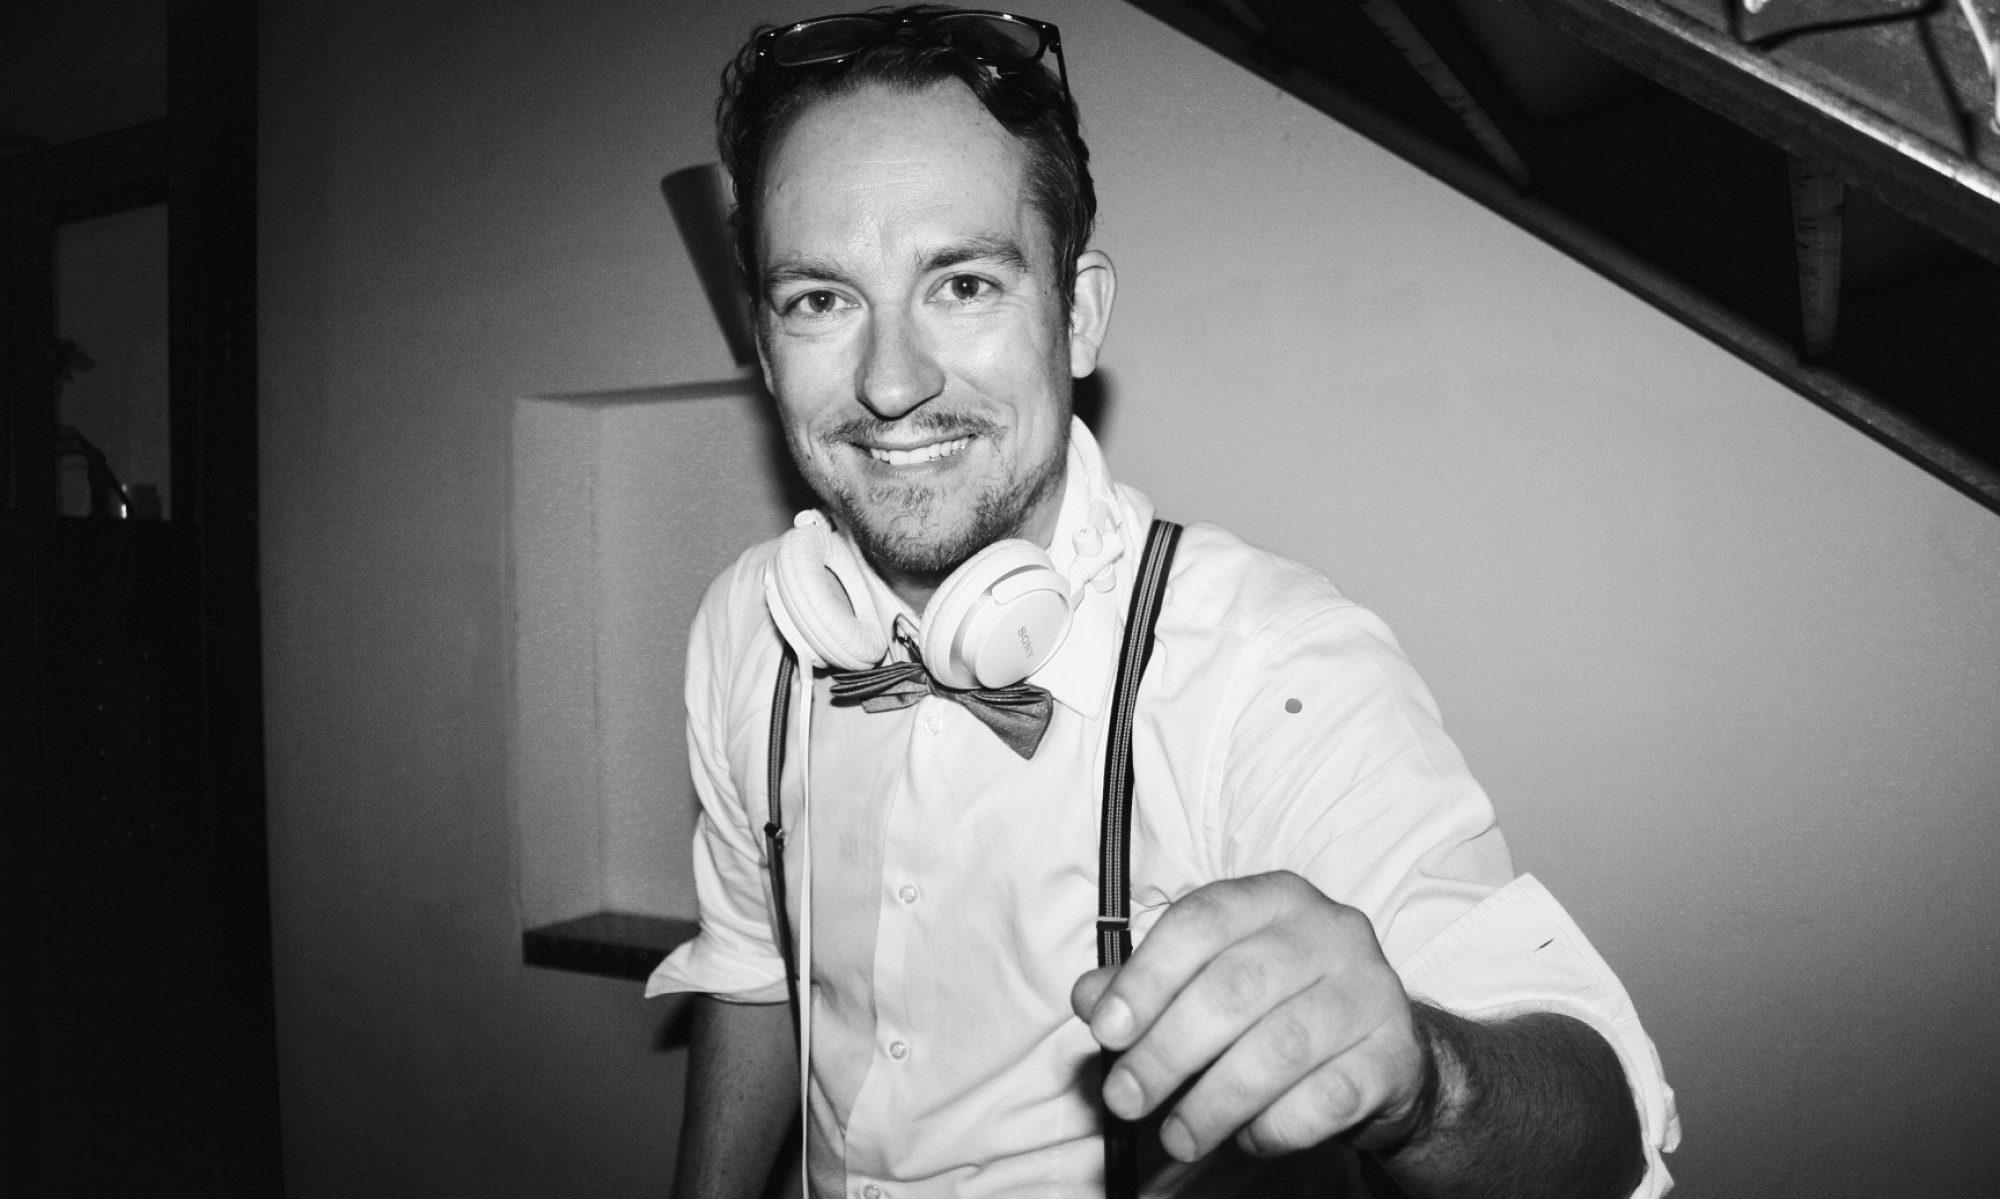 DJ Christian BRECKO